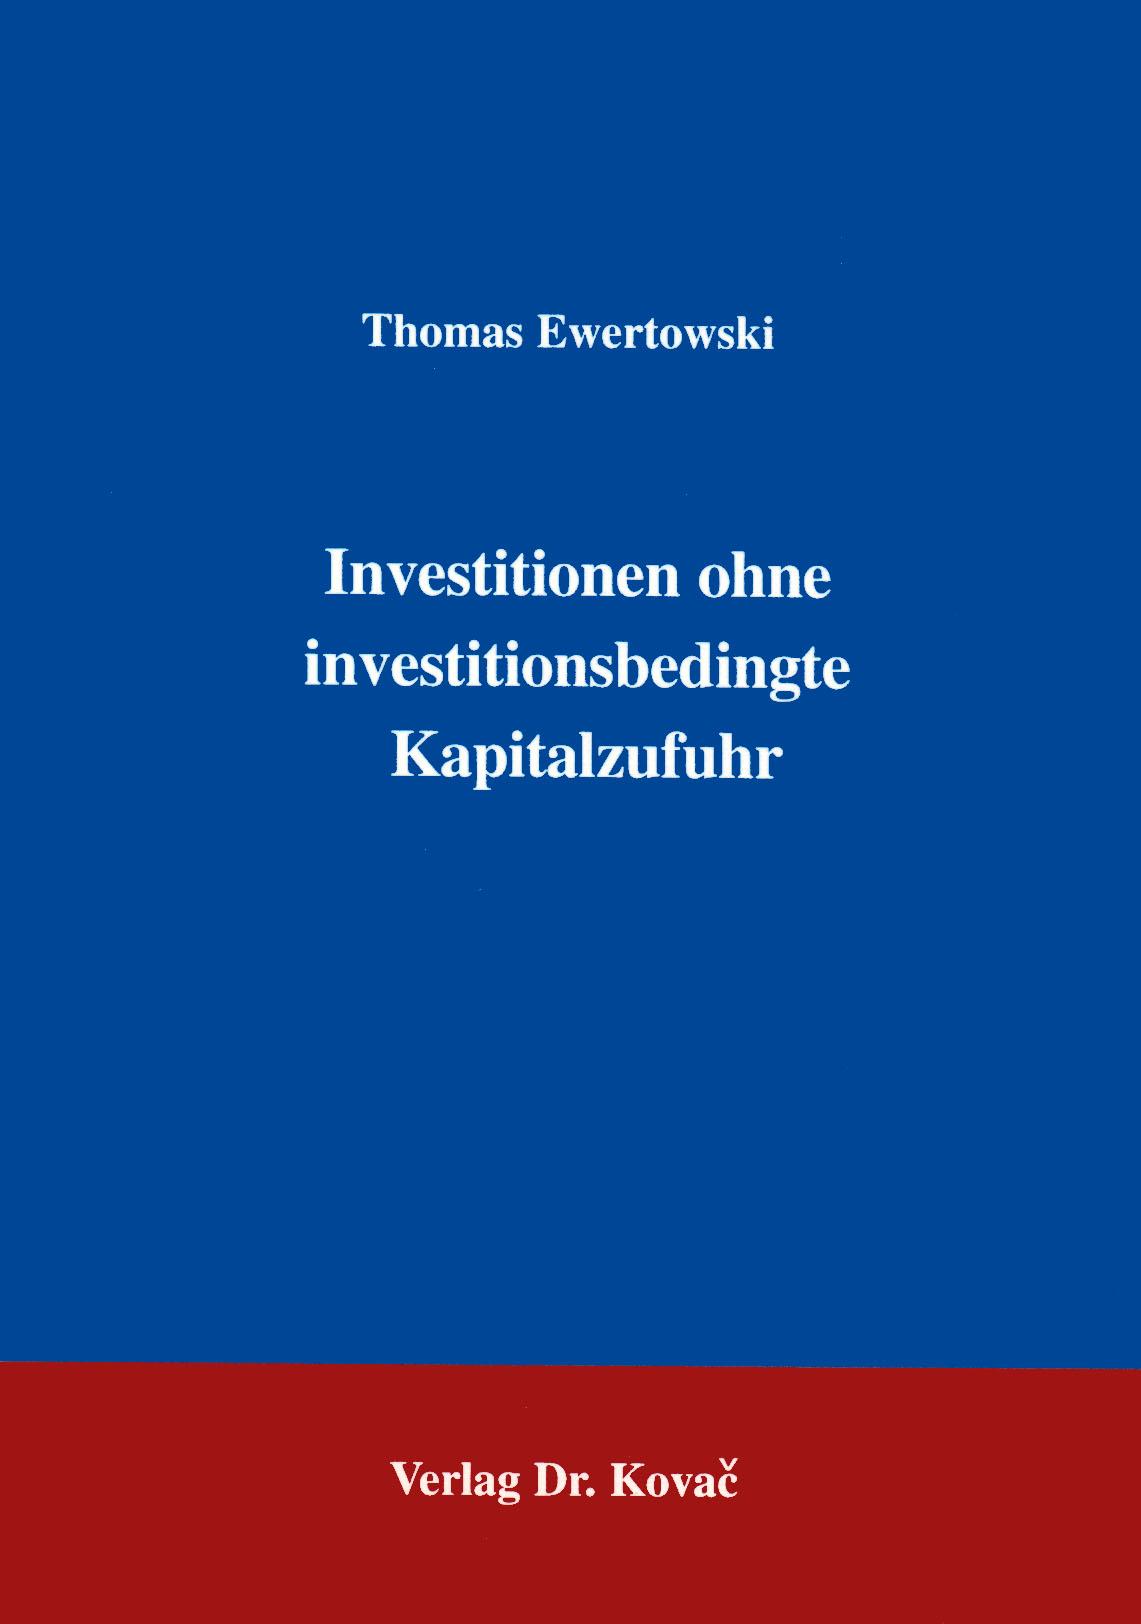 Cover: Investition ohne investitionsbedingte Kapitalzufuhr